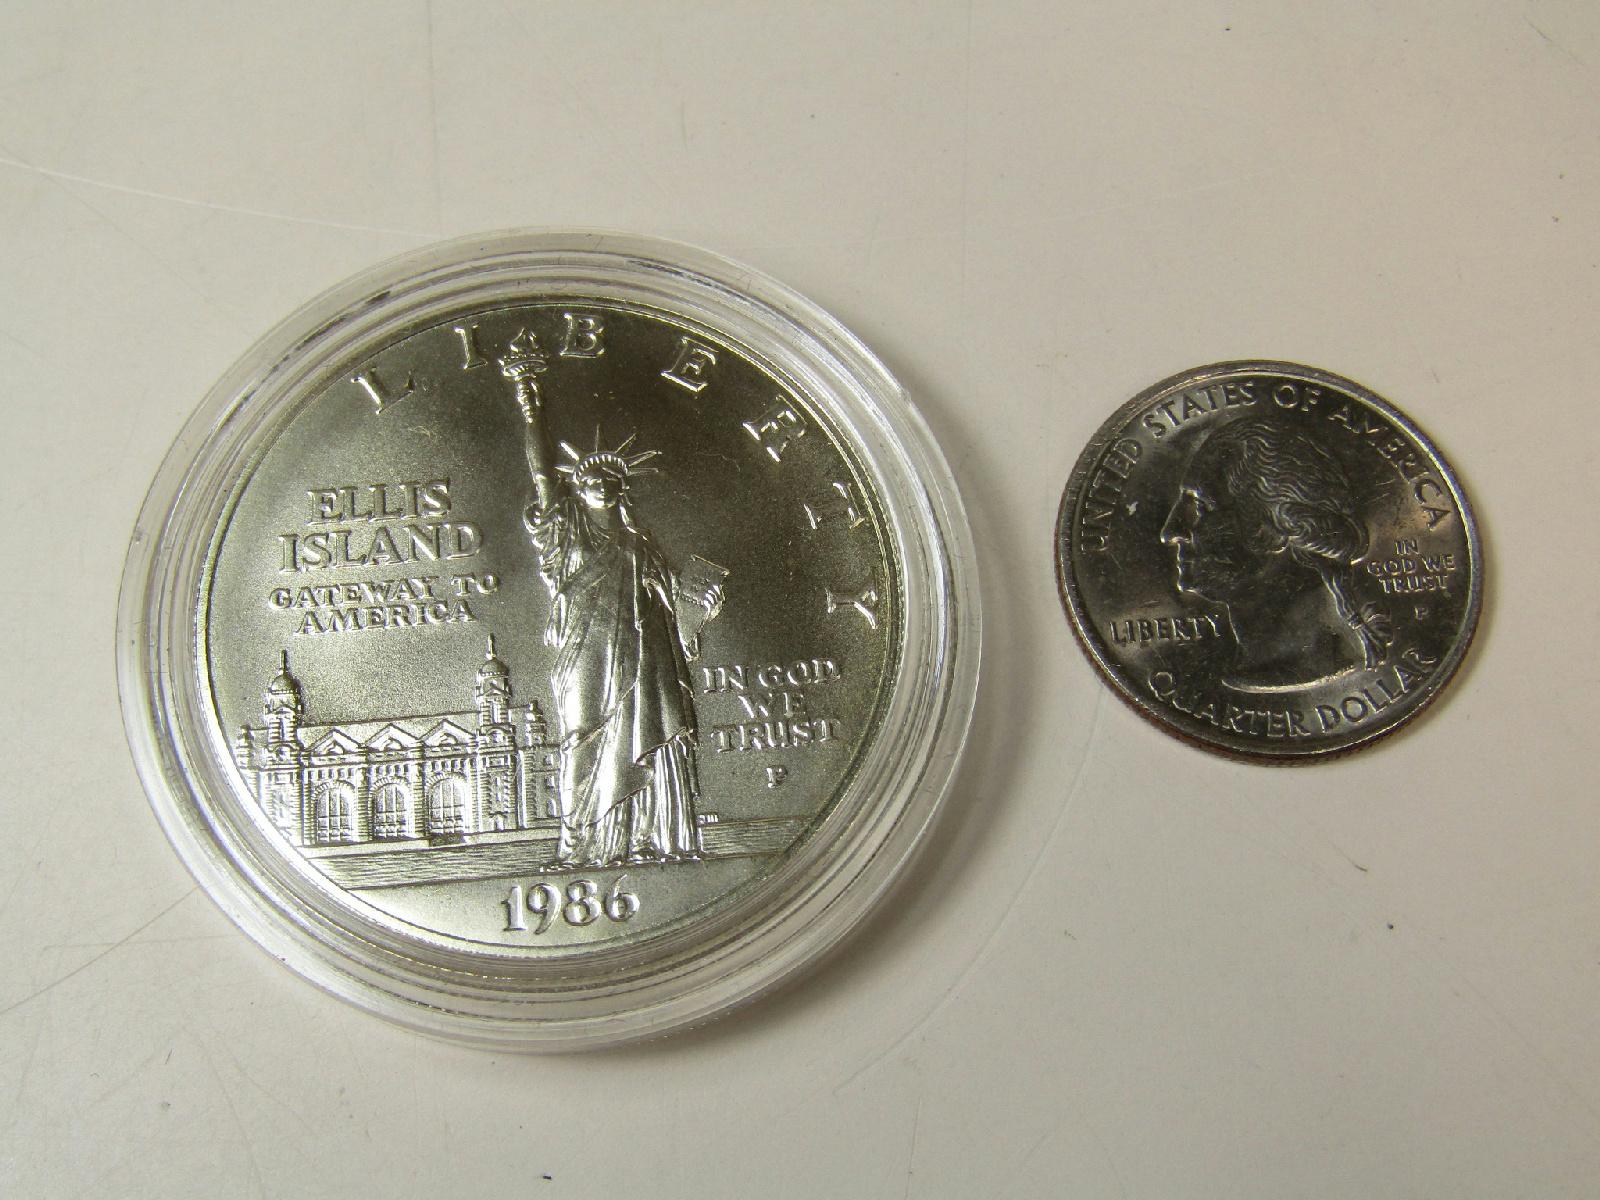 1986 ellis island commemorative coin